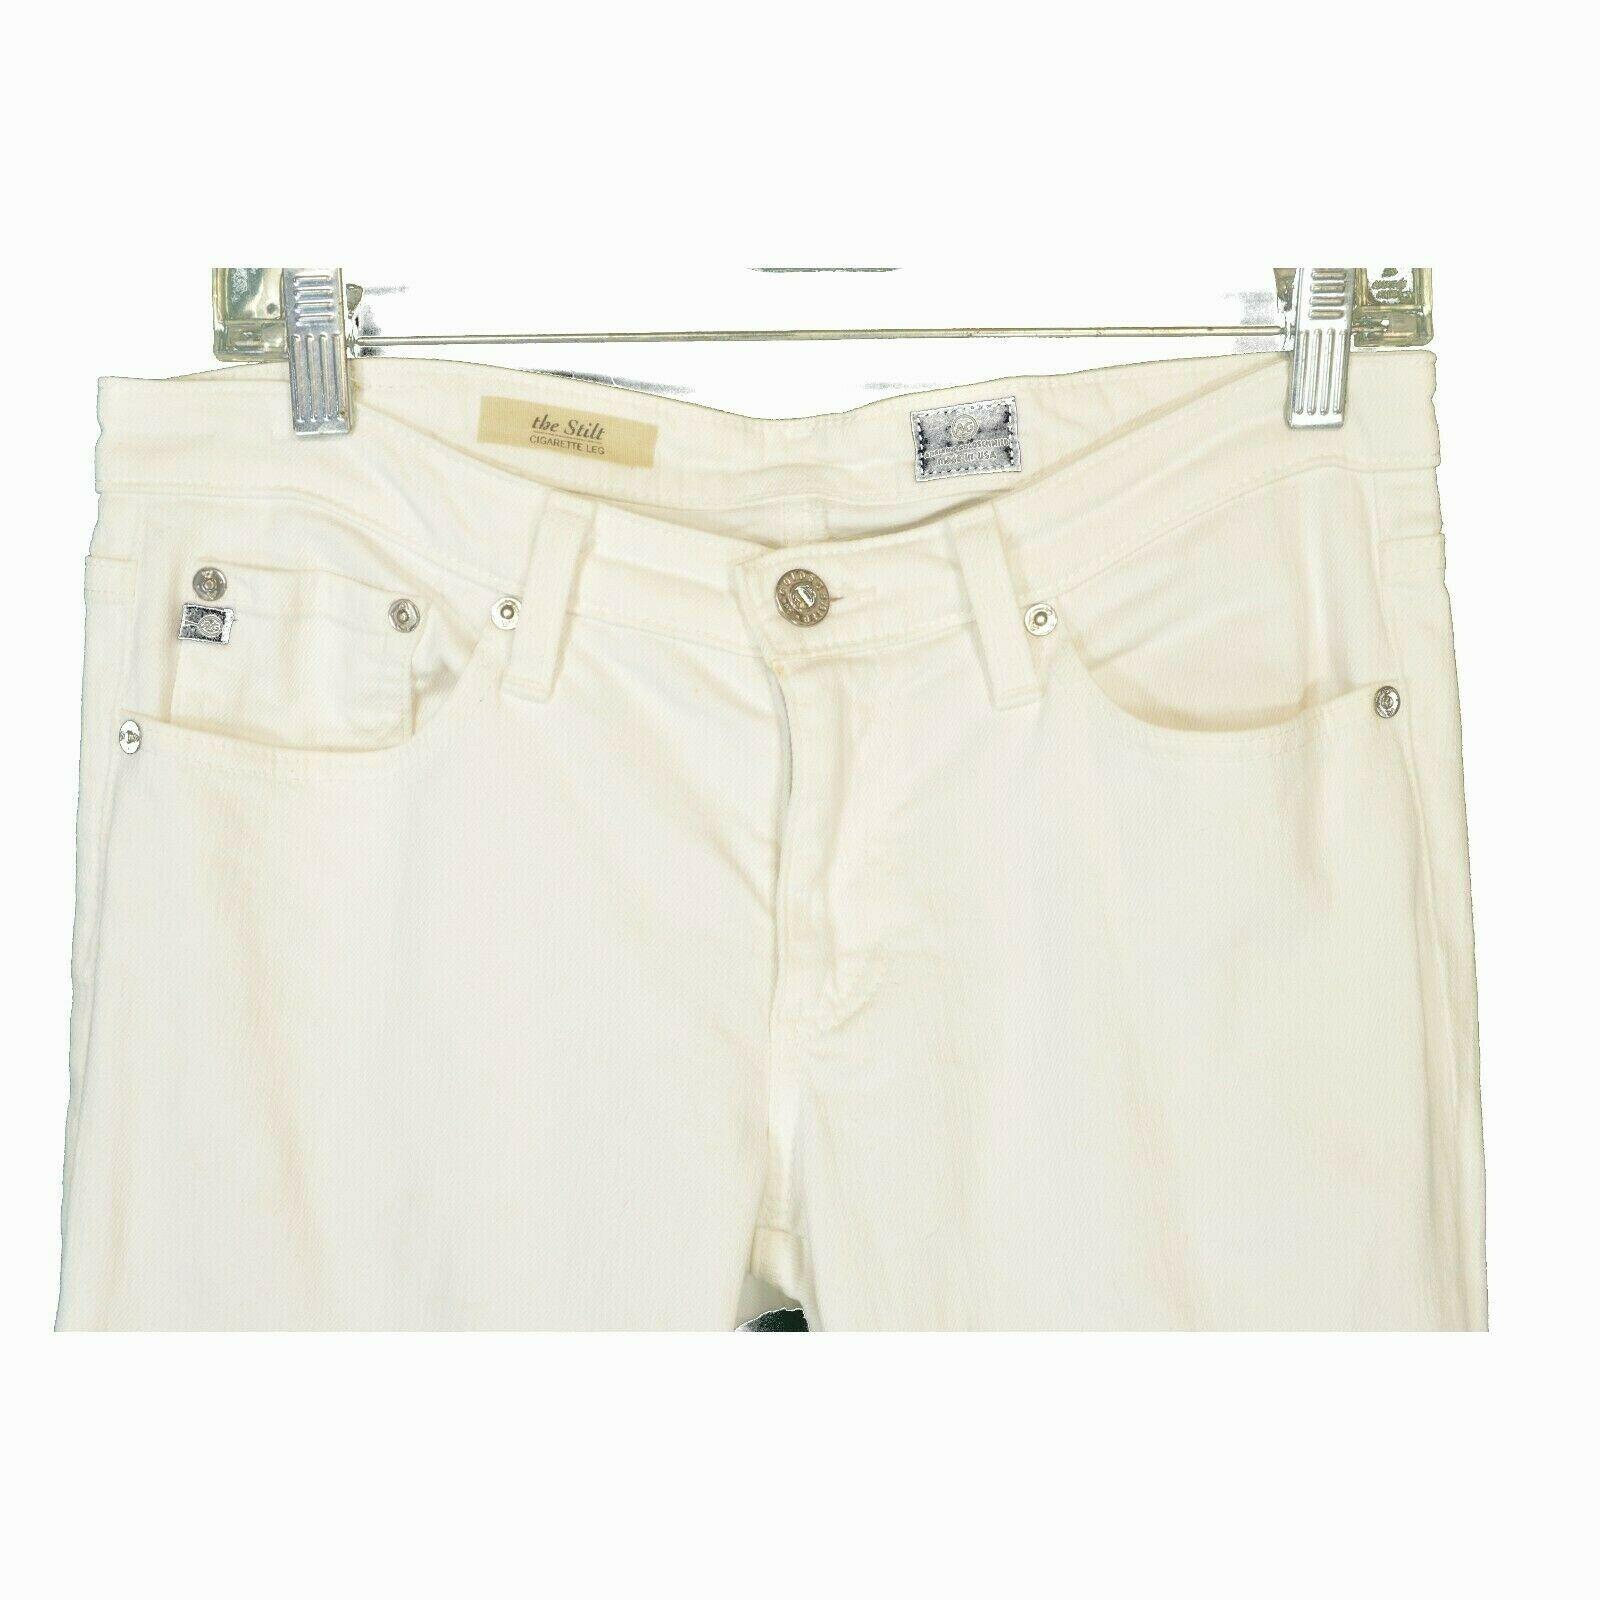 AG Adriano Goldschmied jeans 29 x 31 Stilt cigarette leg White thick EUCUSA image 5